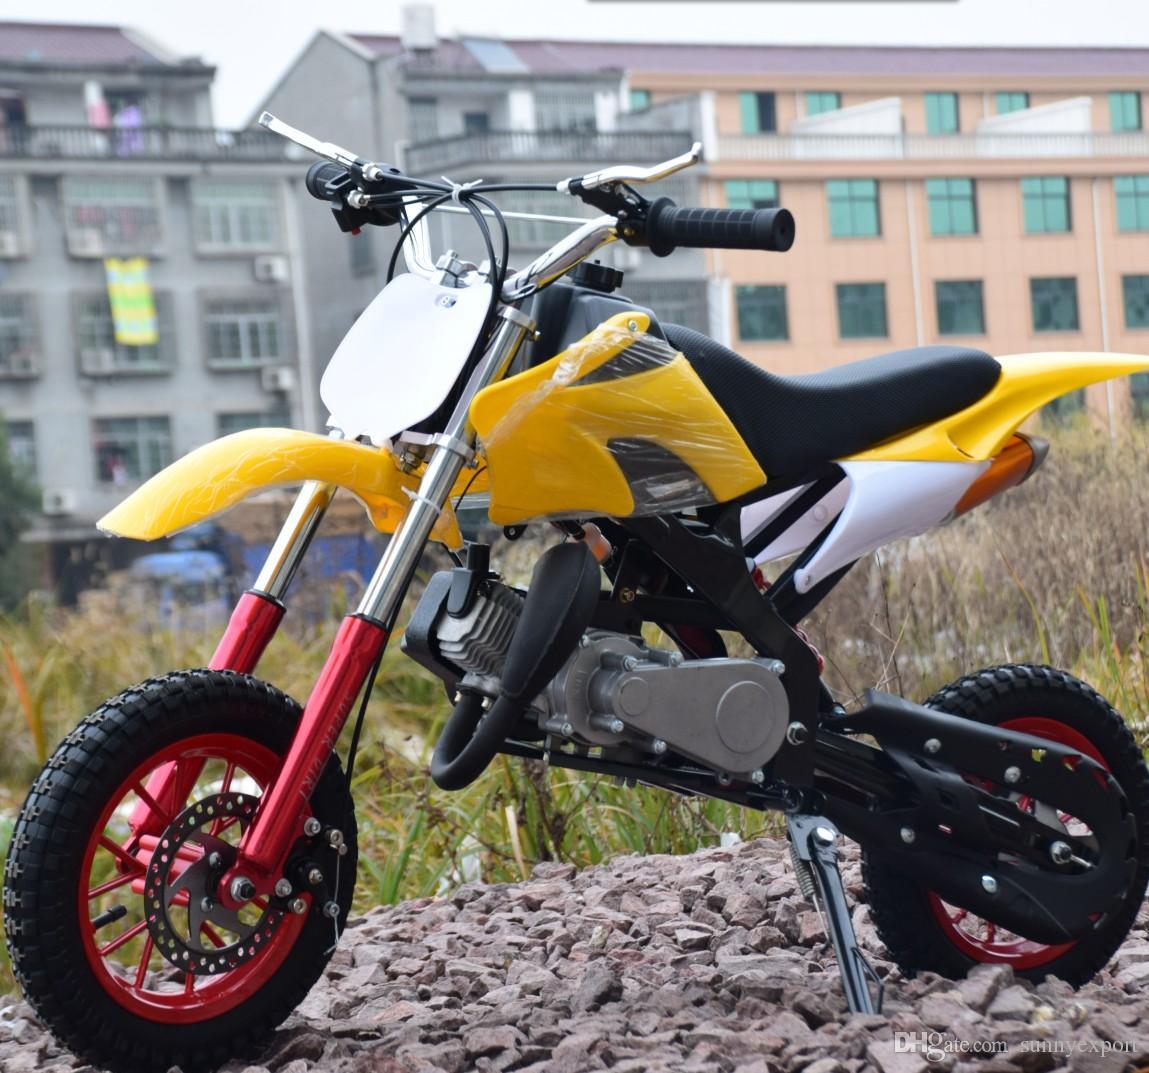 2 Stroke 49cc Mini Dirt Bike for Kids Electric Starter Children Petrol  Motorcycle Bike Gas Motorbike Pocket Bike